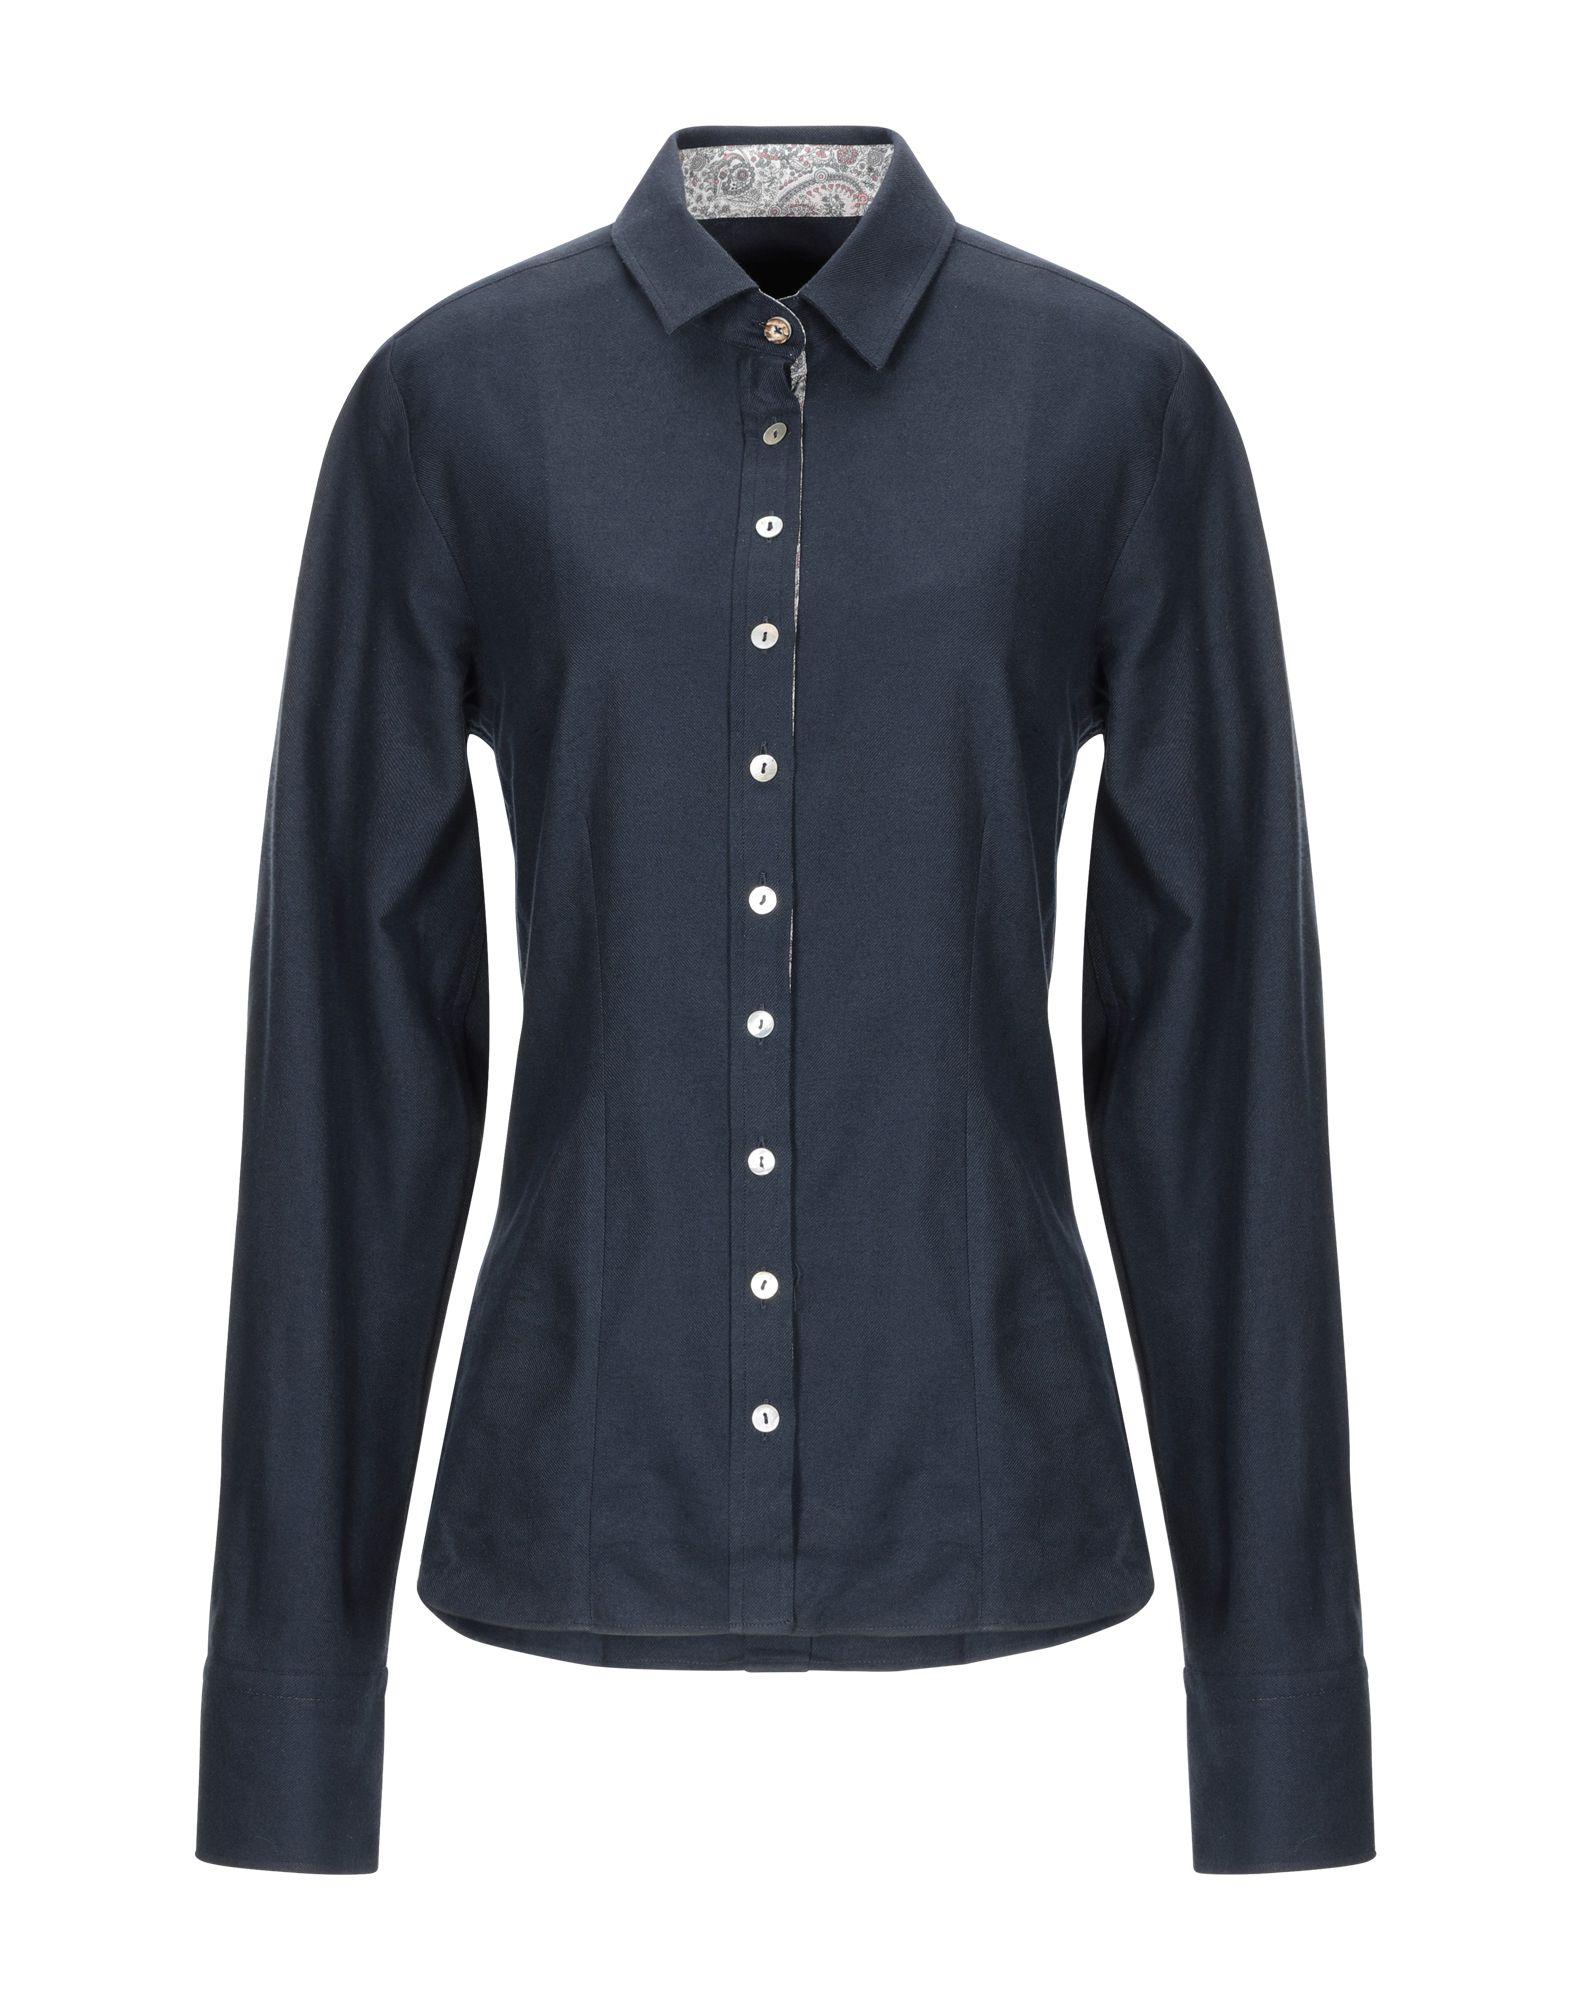 лучшая цена WANDERLUST Pубашка